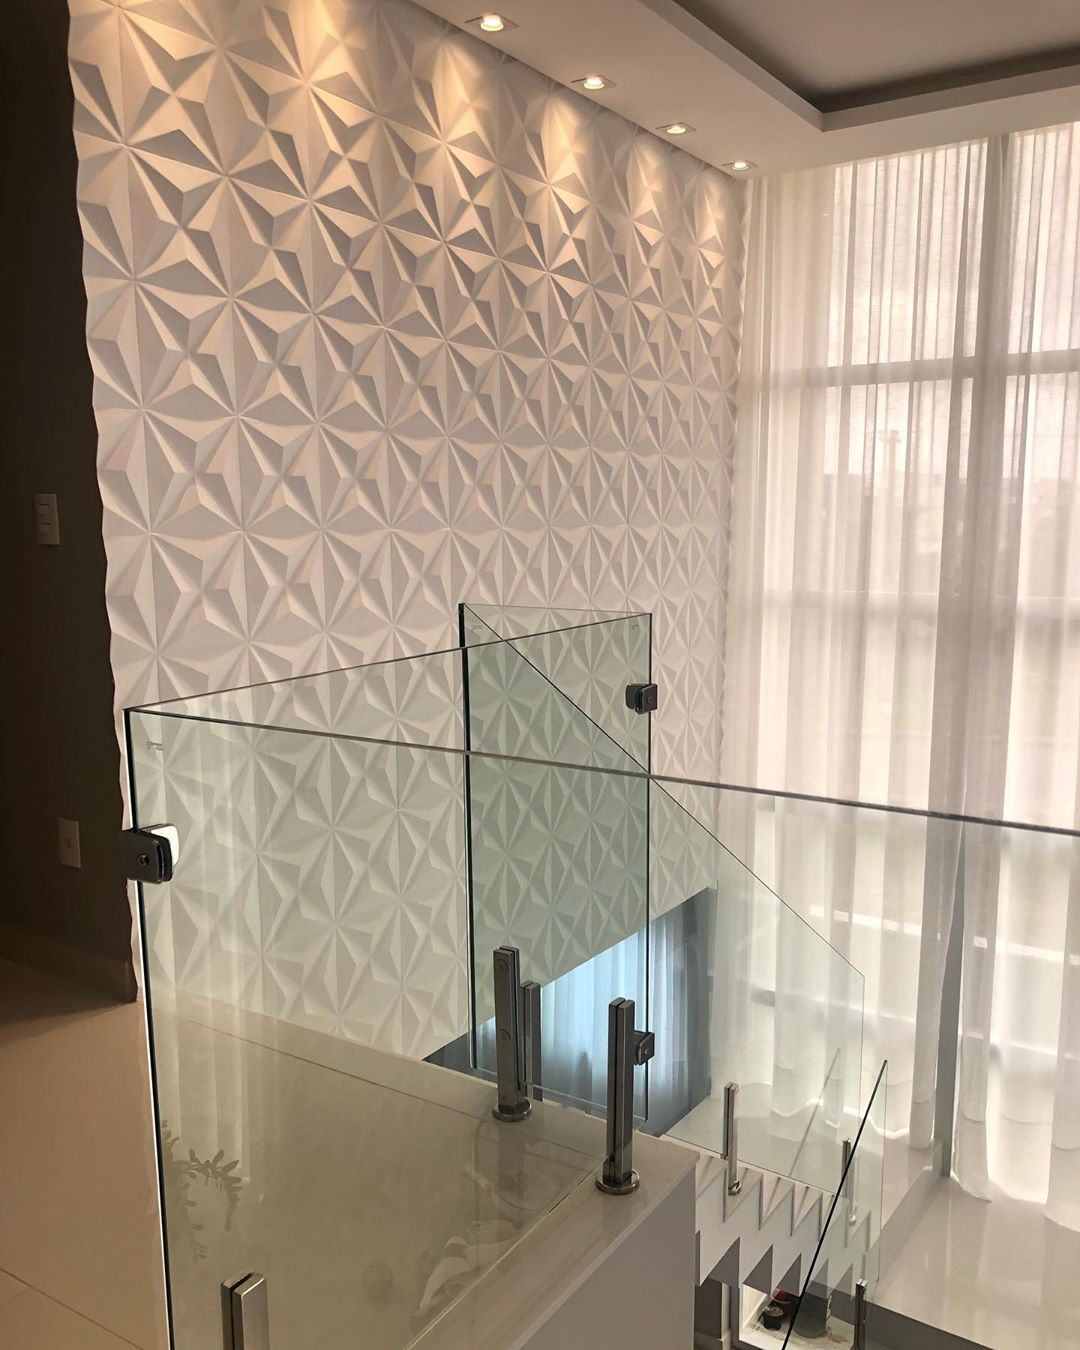 guarda-corpo vidro em escada minimalista